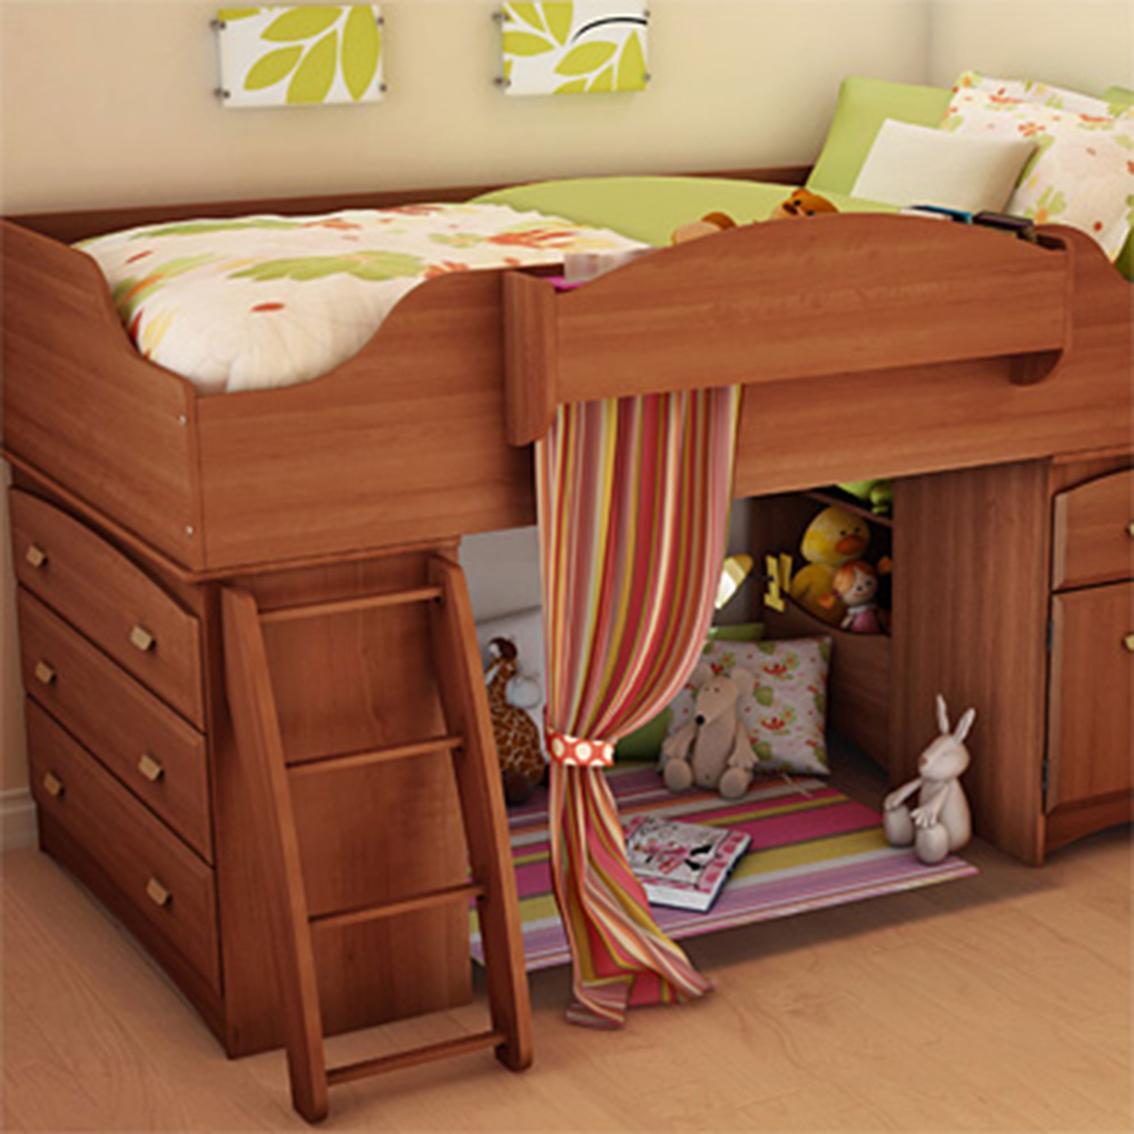 south shore imagine complete twin loft top bed beds home rh shopmyexchange com south shore treehouse loft bed south shore tiara loft bed